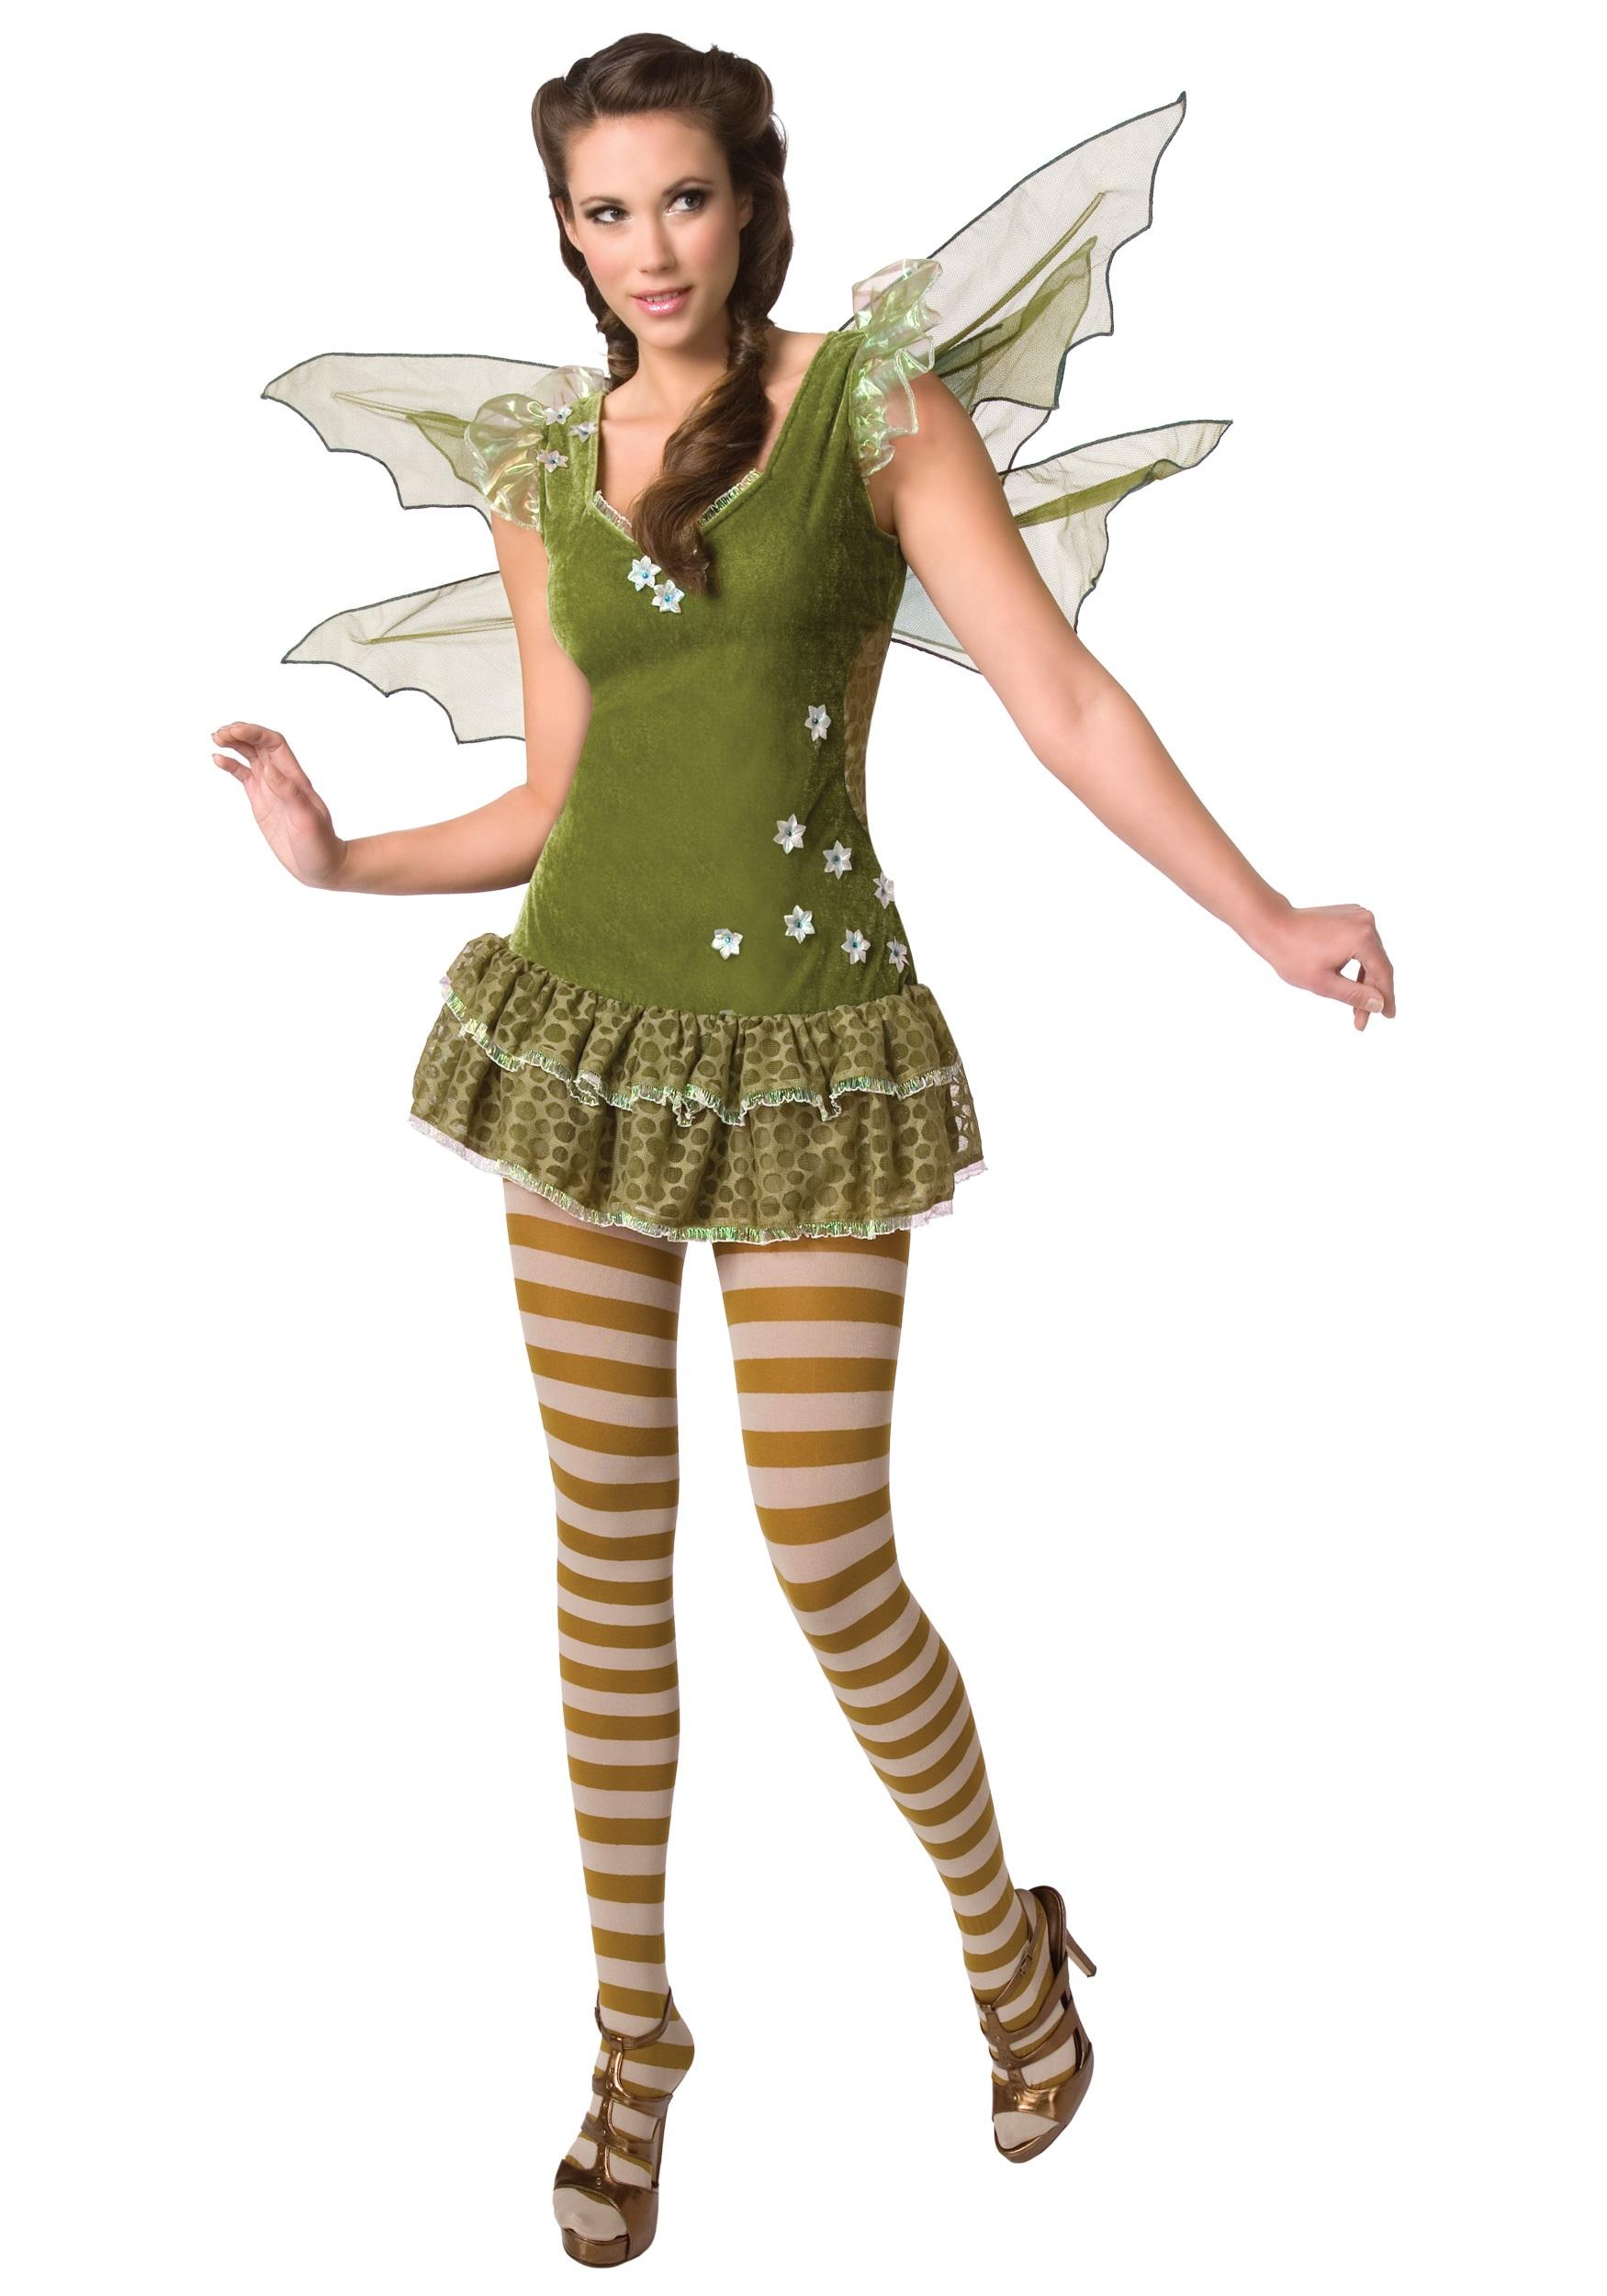 d7d54234c5a Sexy Fairy Halloween Costume